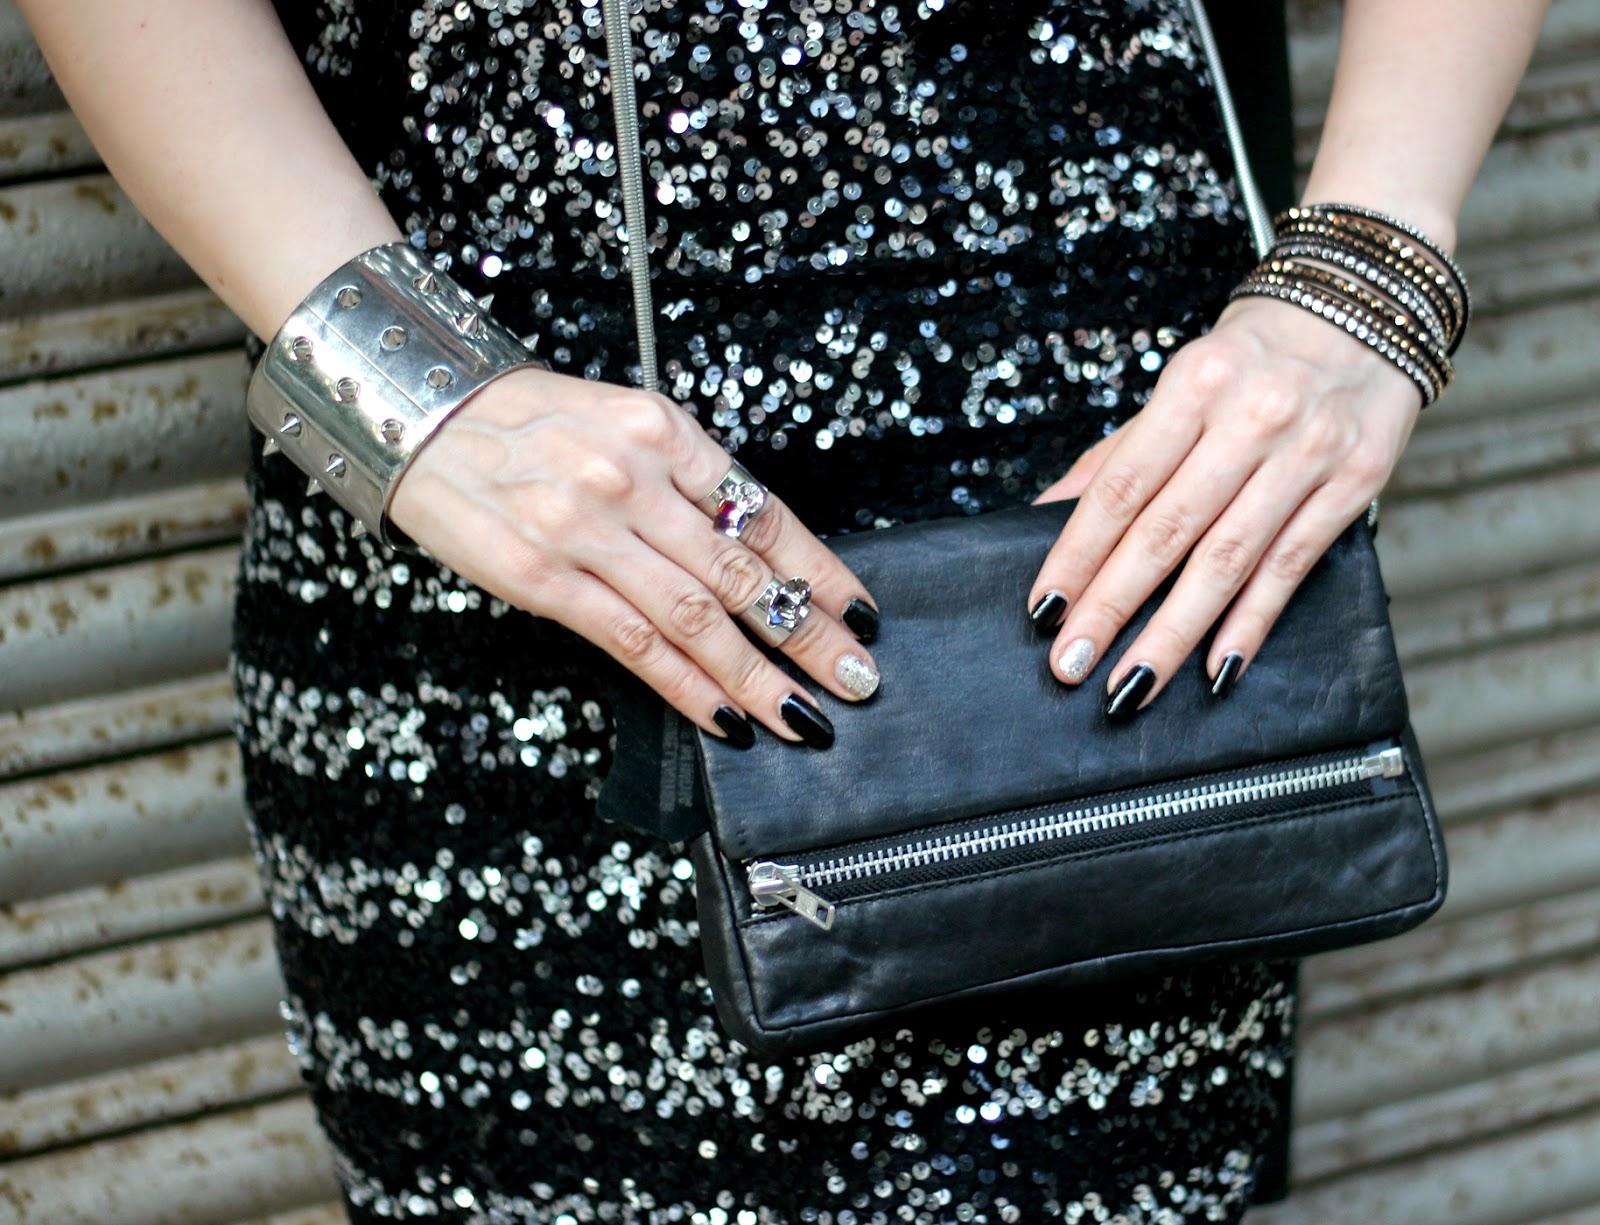 Vero Moda Faux Leather Zipper Sling Bag, Spike hand cuff, Swarovski Slake Bracelet